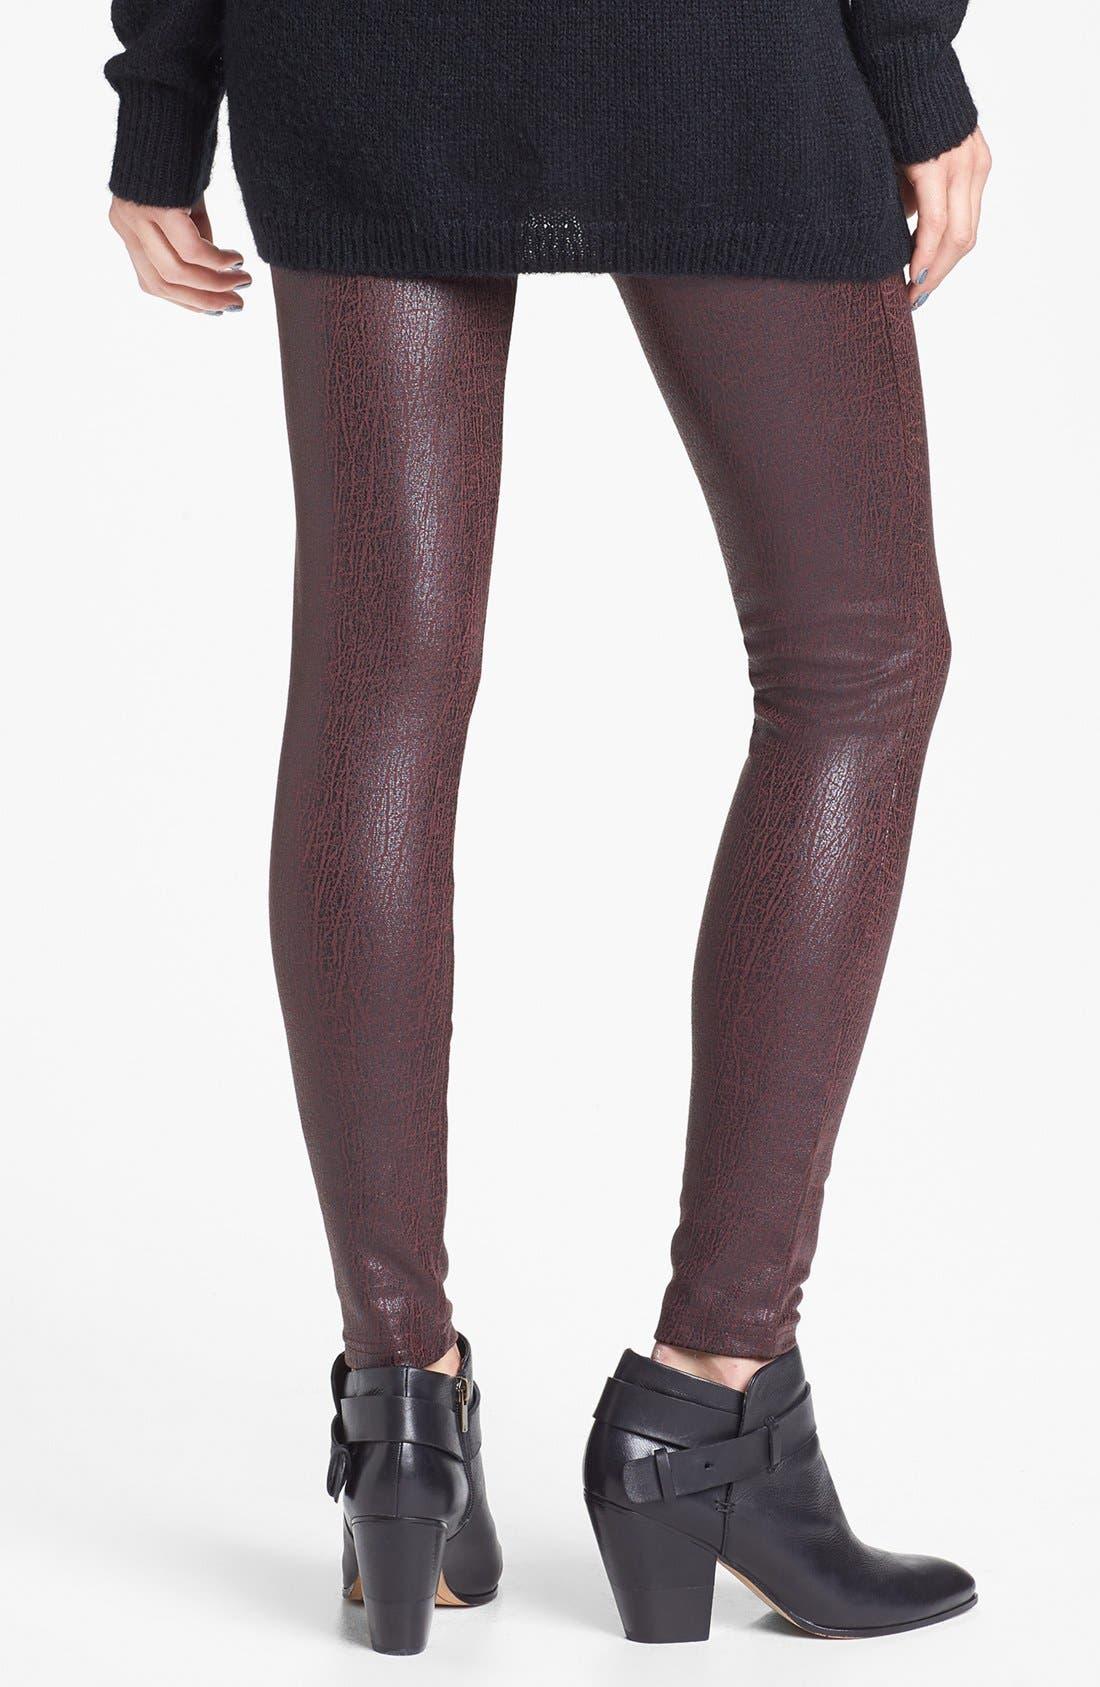 BP., Crackled Faux Leather Leggings, Alternate thumbnail 2, color, 600